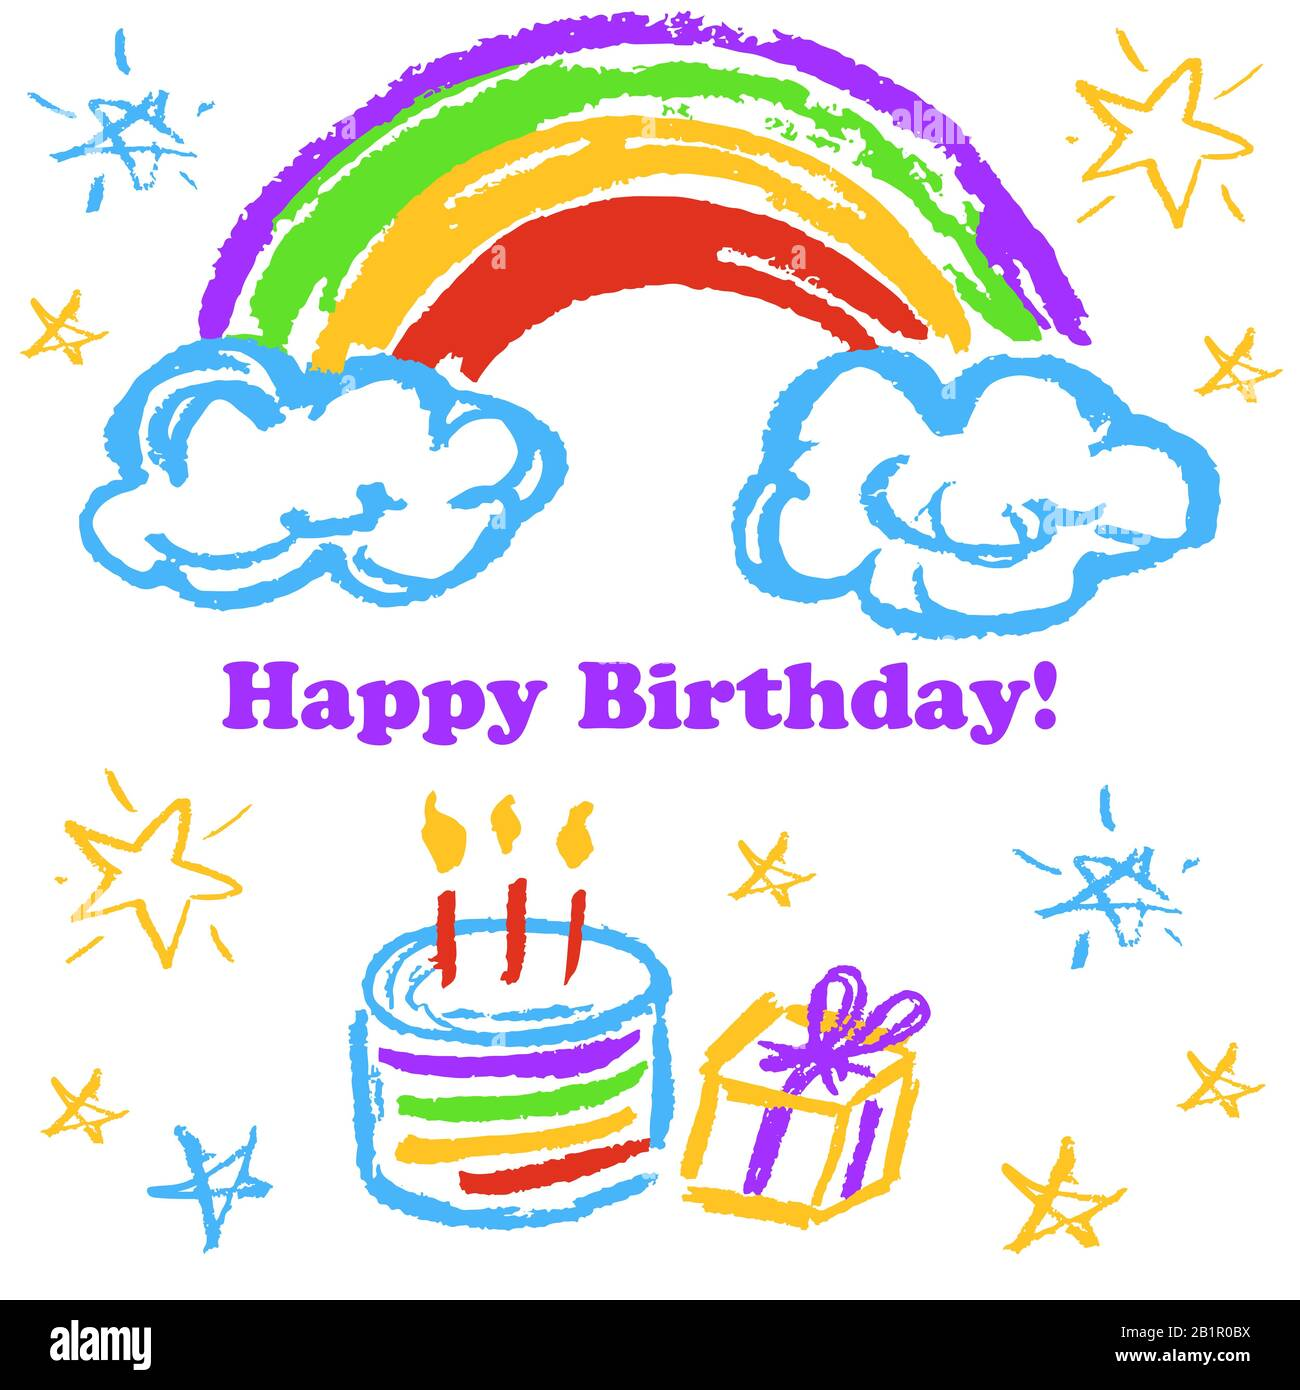 Children S Drawings Greeting Card Flyer Banner Happy Birthday Rainbow Cake Gift Stock Vector Image Art Alamy